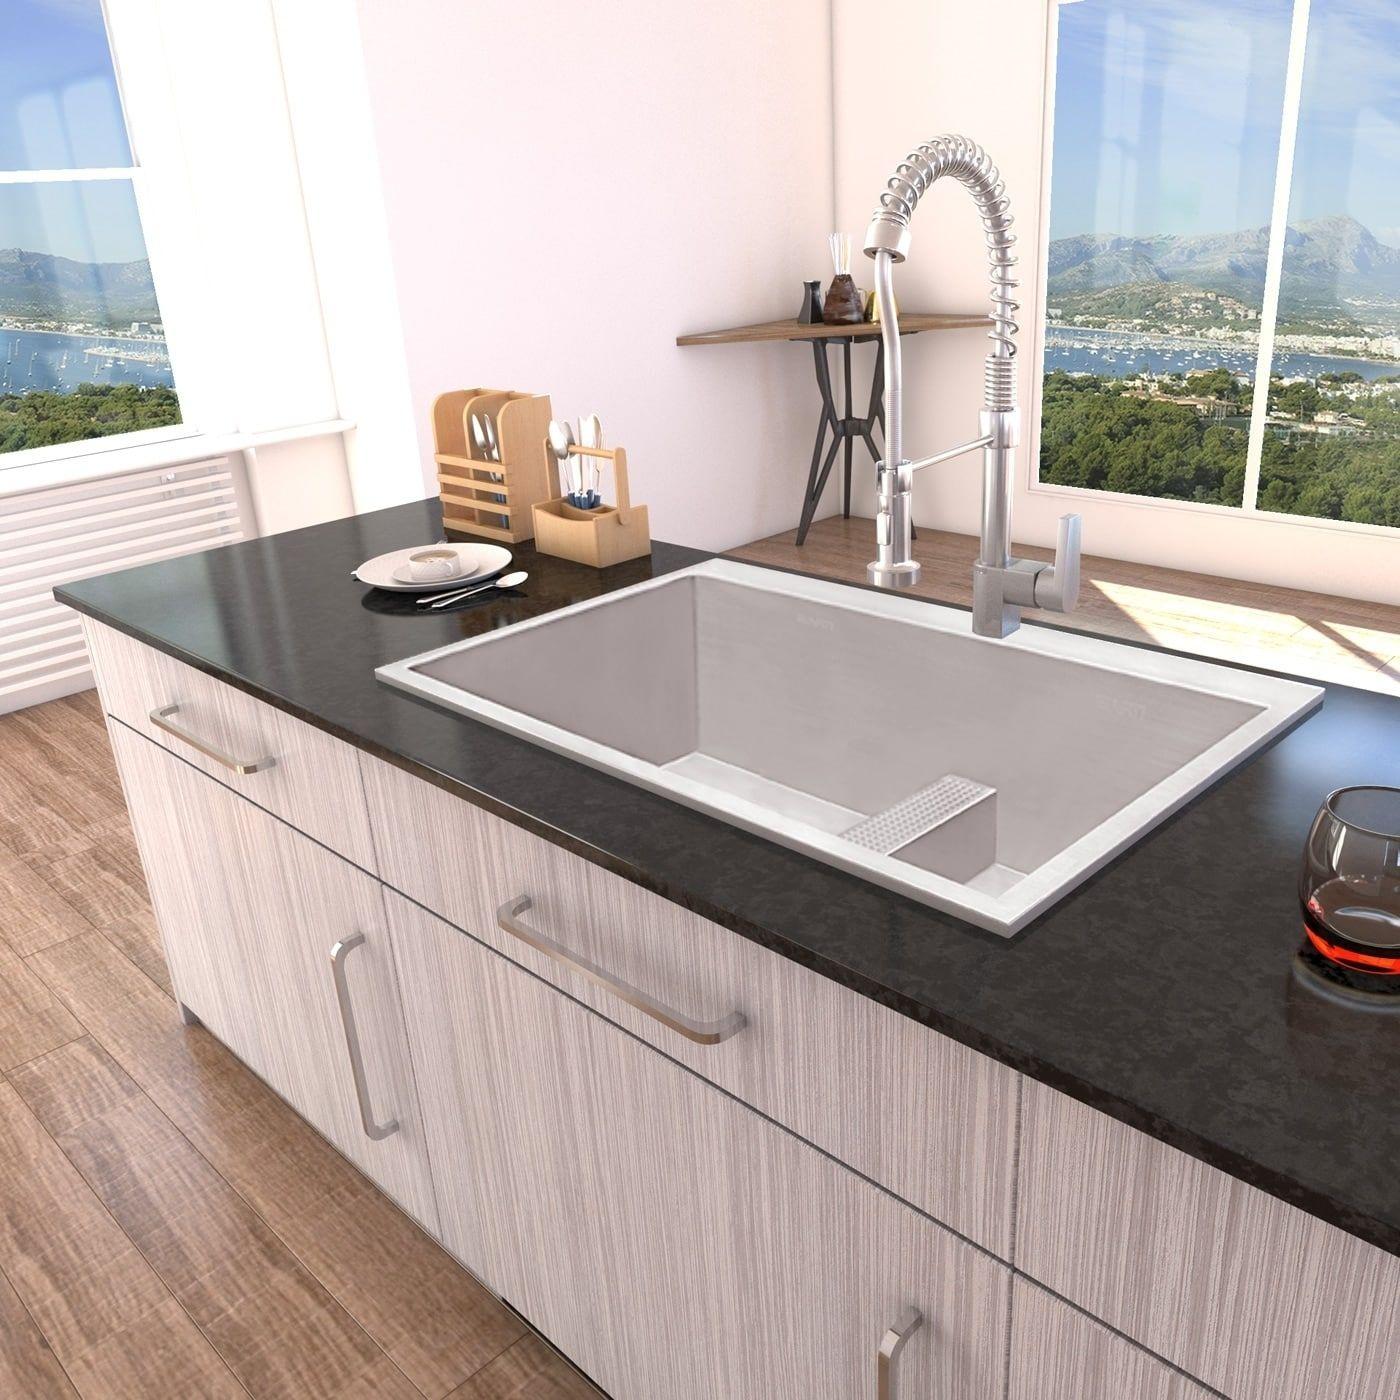 Ruvati 33 Inch Drop In Low Platform Divide Zero Radius 60 40 Double Bowl 16 Gauge Topmount Kitchen Sink Rvh8059 Drop In Kitchen Sink Double Bowl Kitchen Sink Top Mount Kitchen Sink